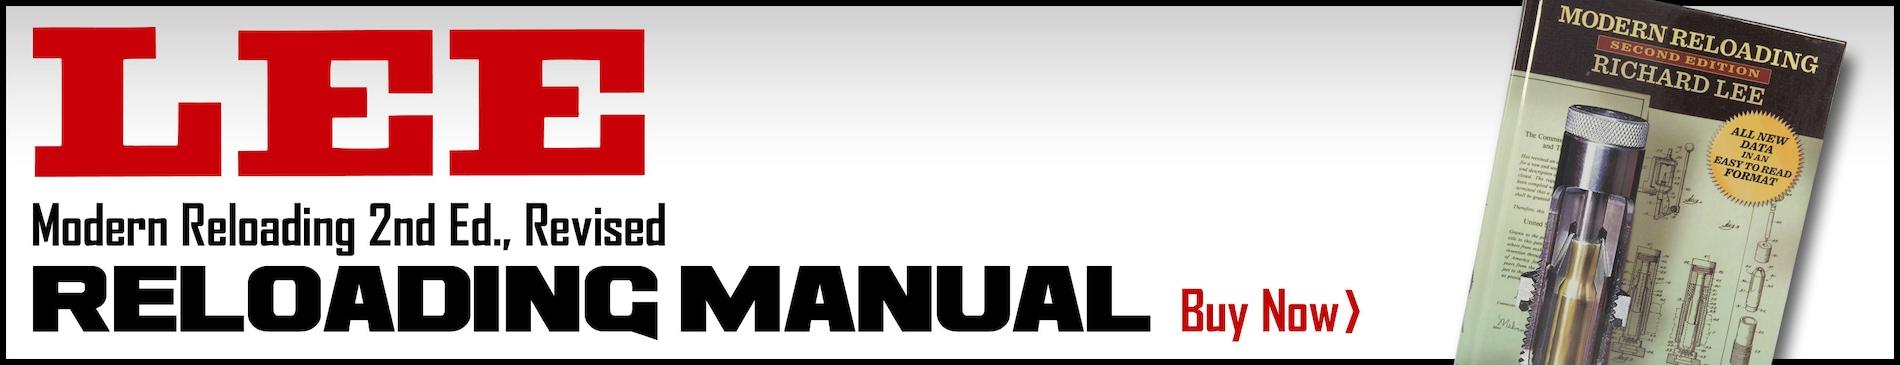 Lee Reloading Manual